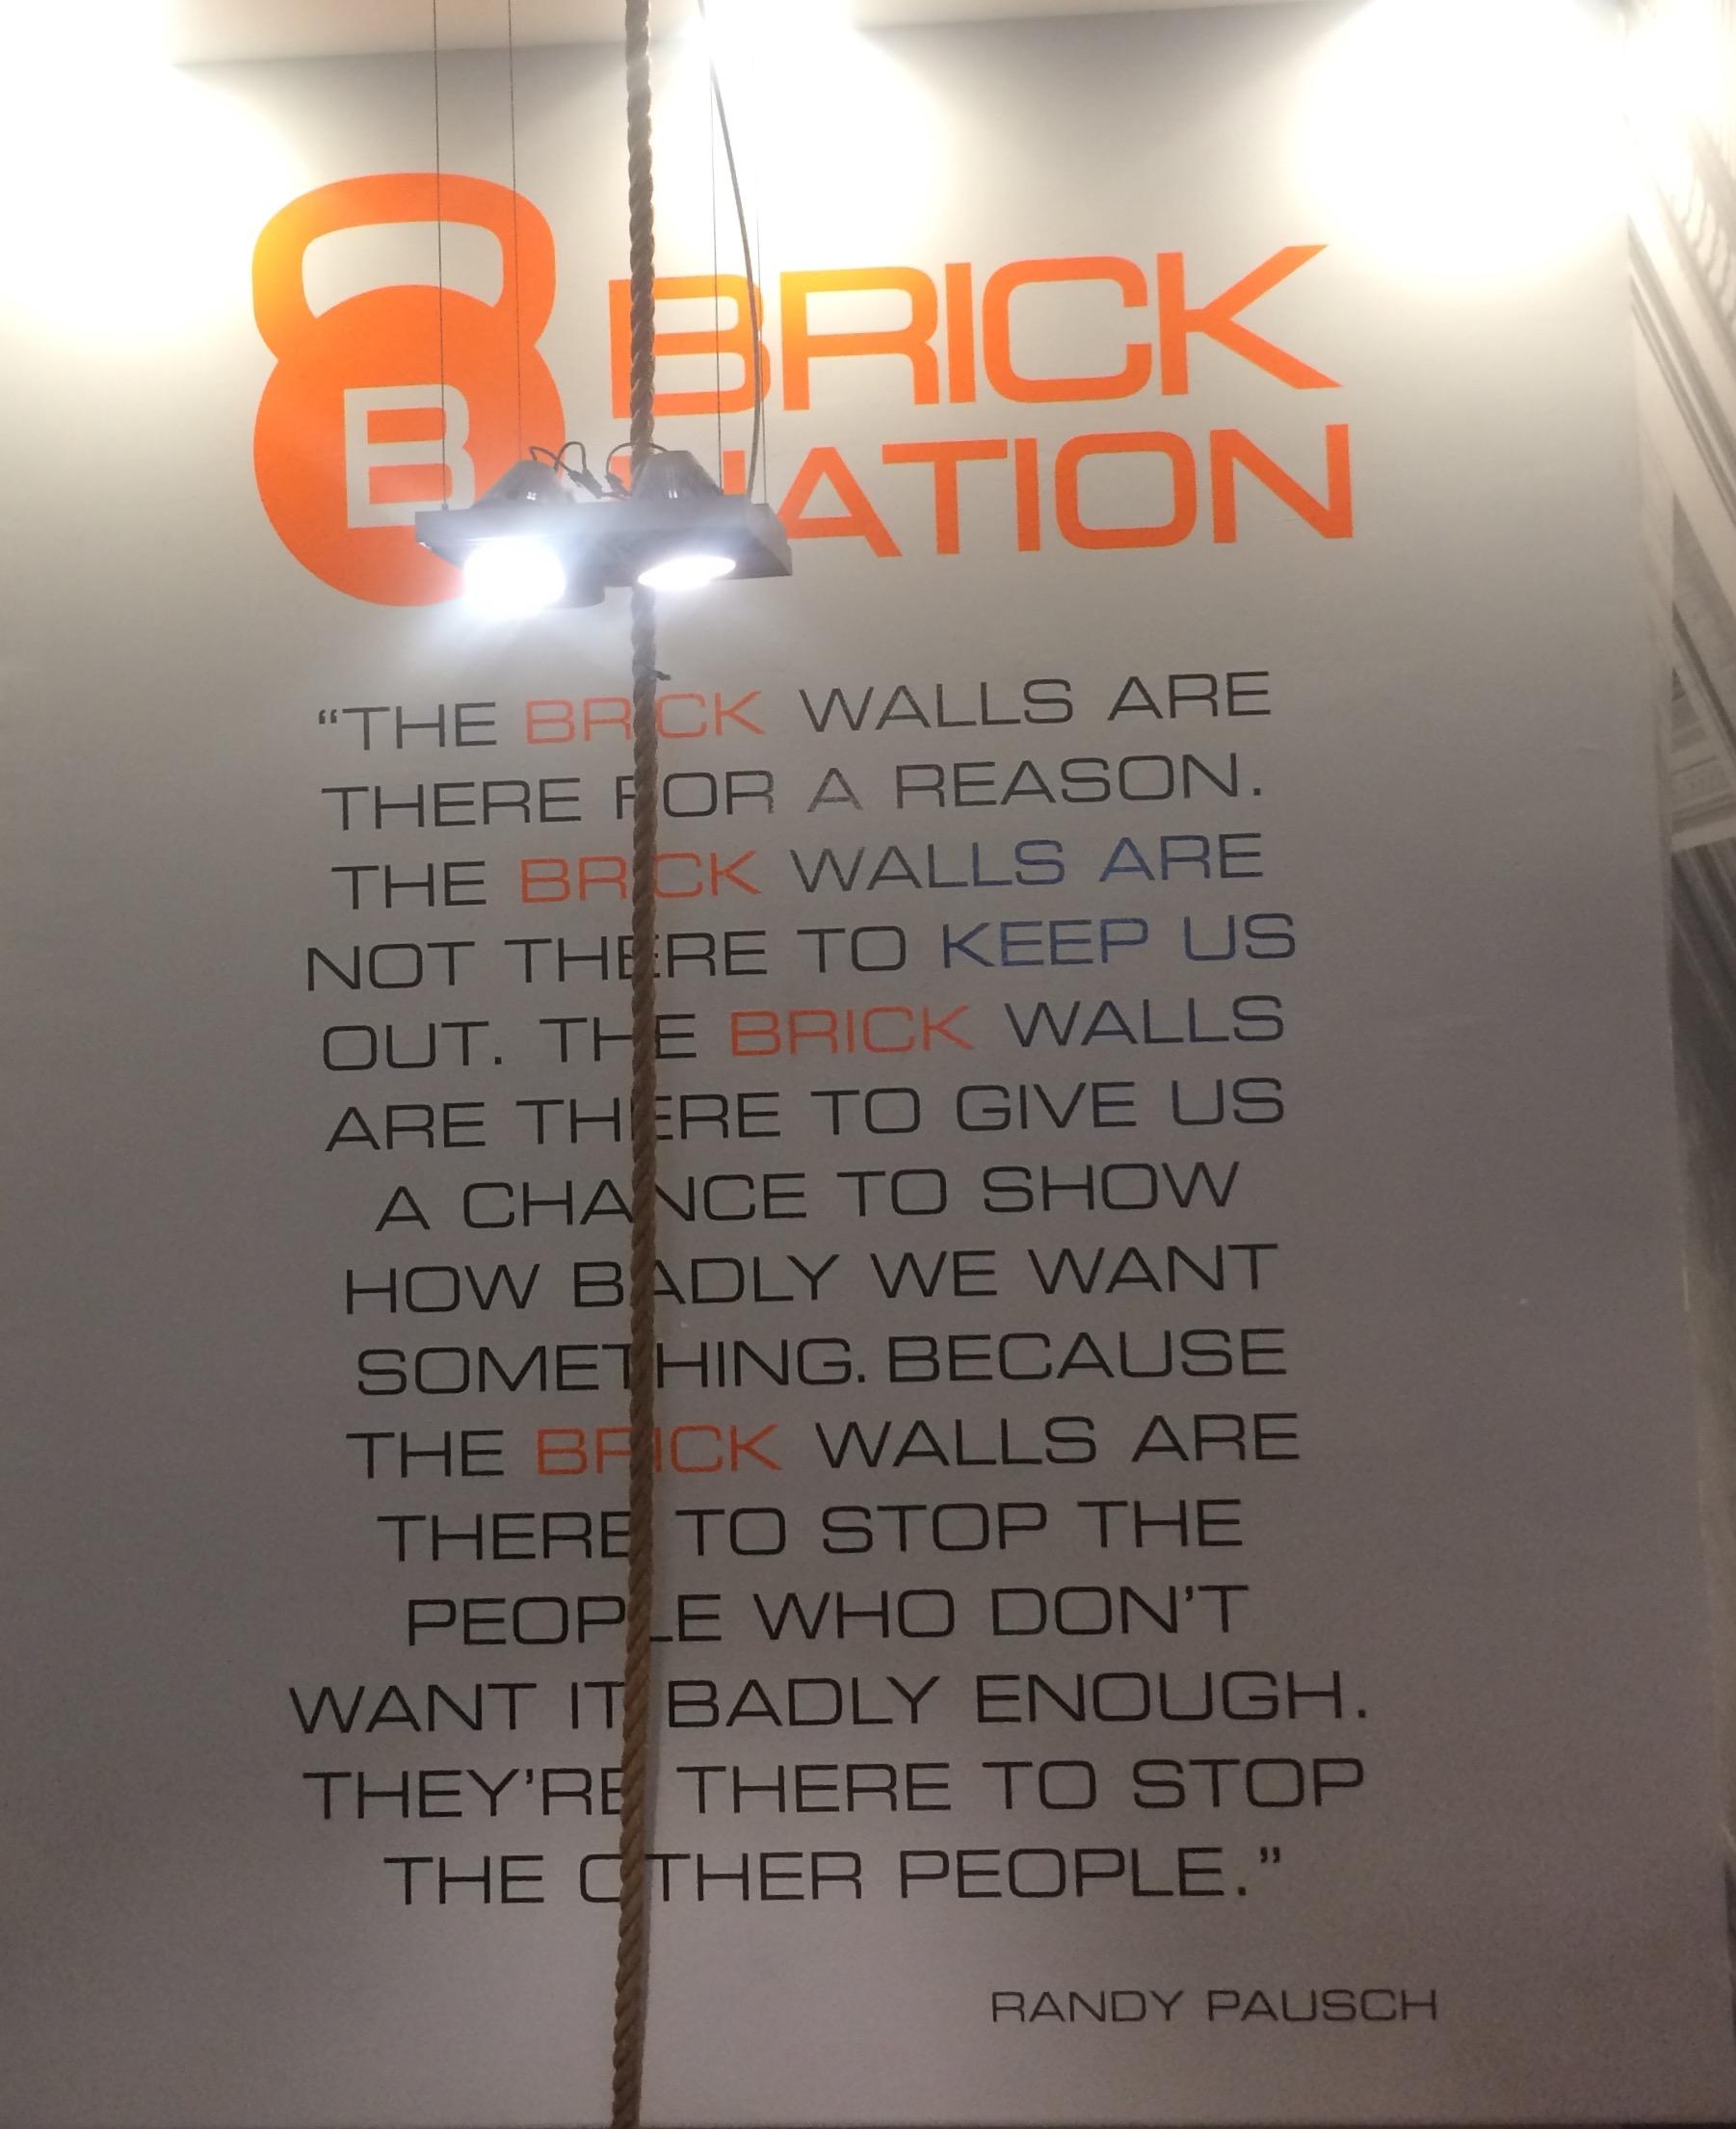 Brick Crossfit NYC